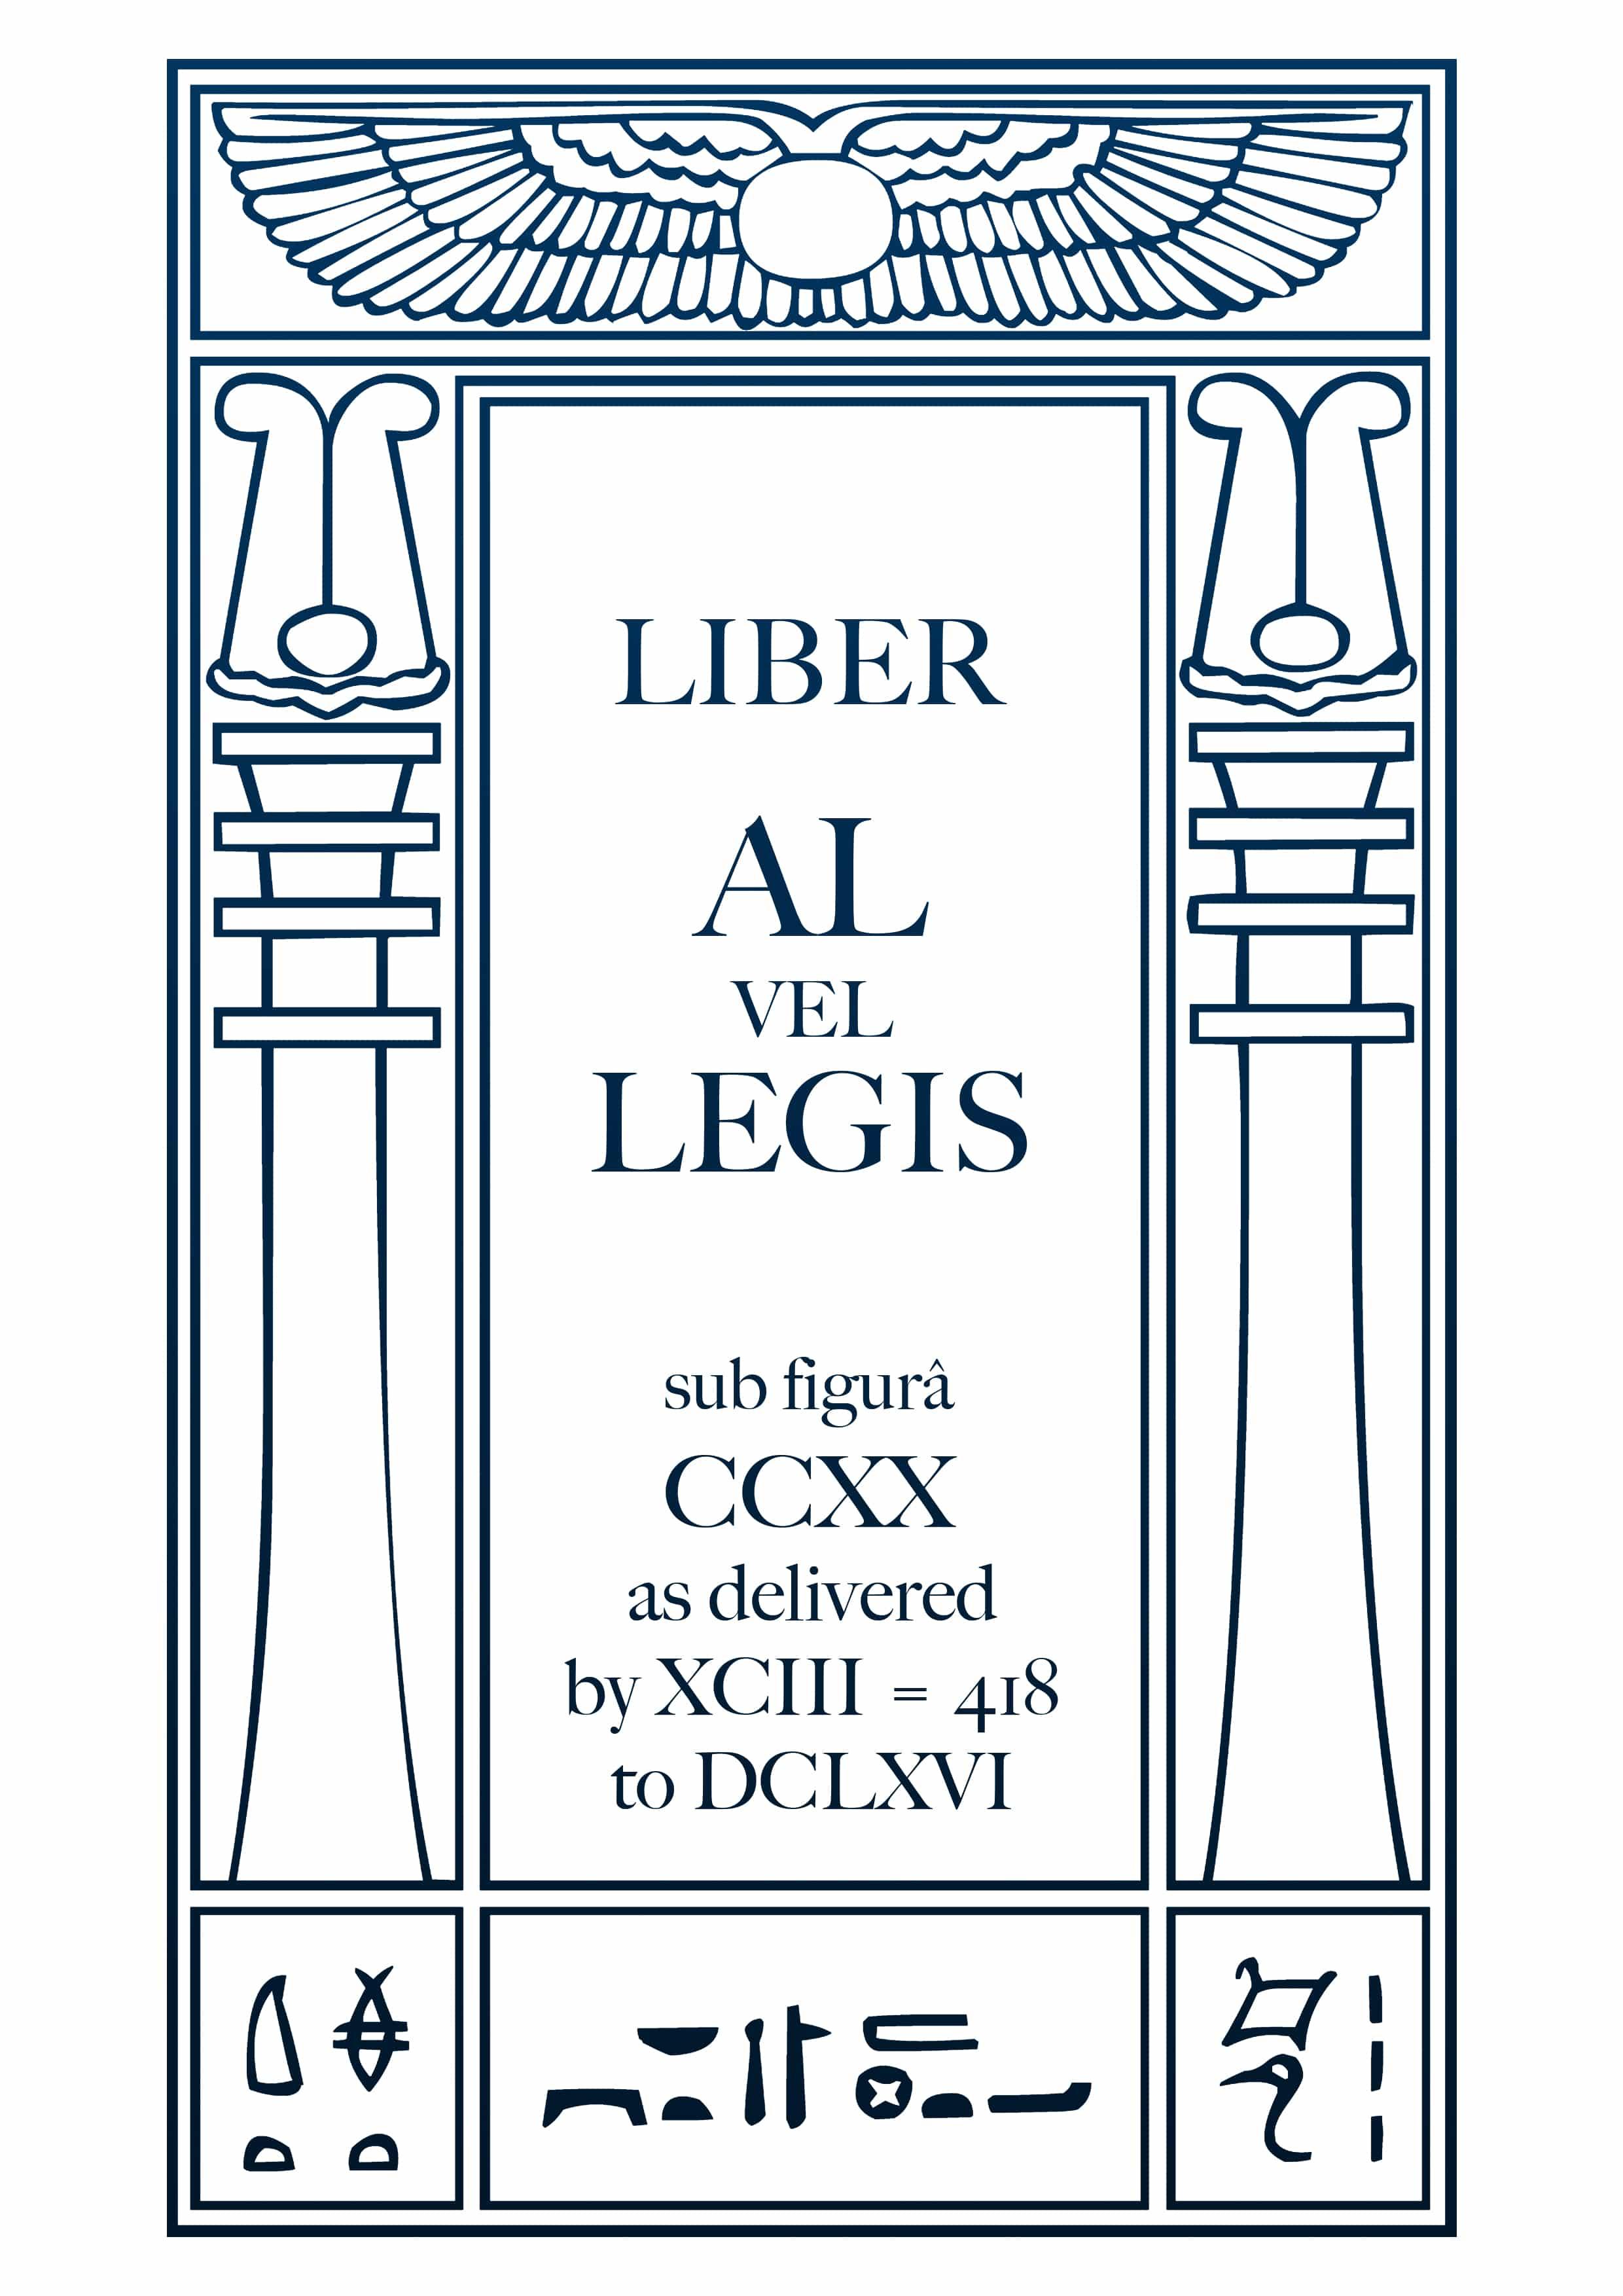 Liber AL vel Legis sub figurâ CCXX as delivered by XCIII = 418 to DCLXVI